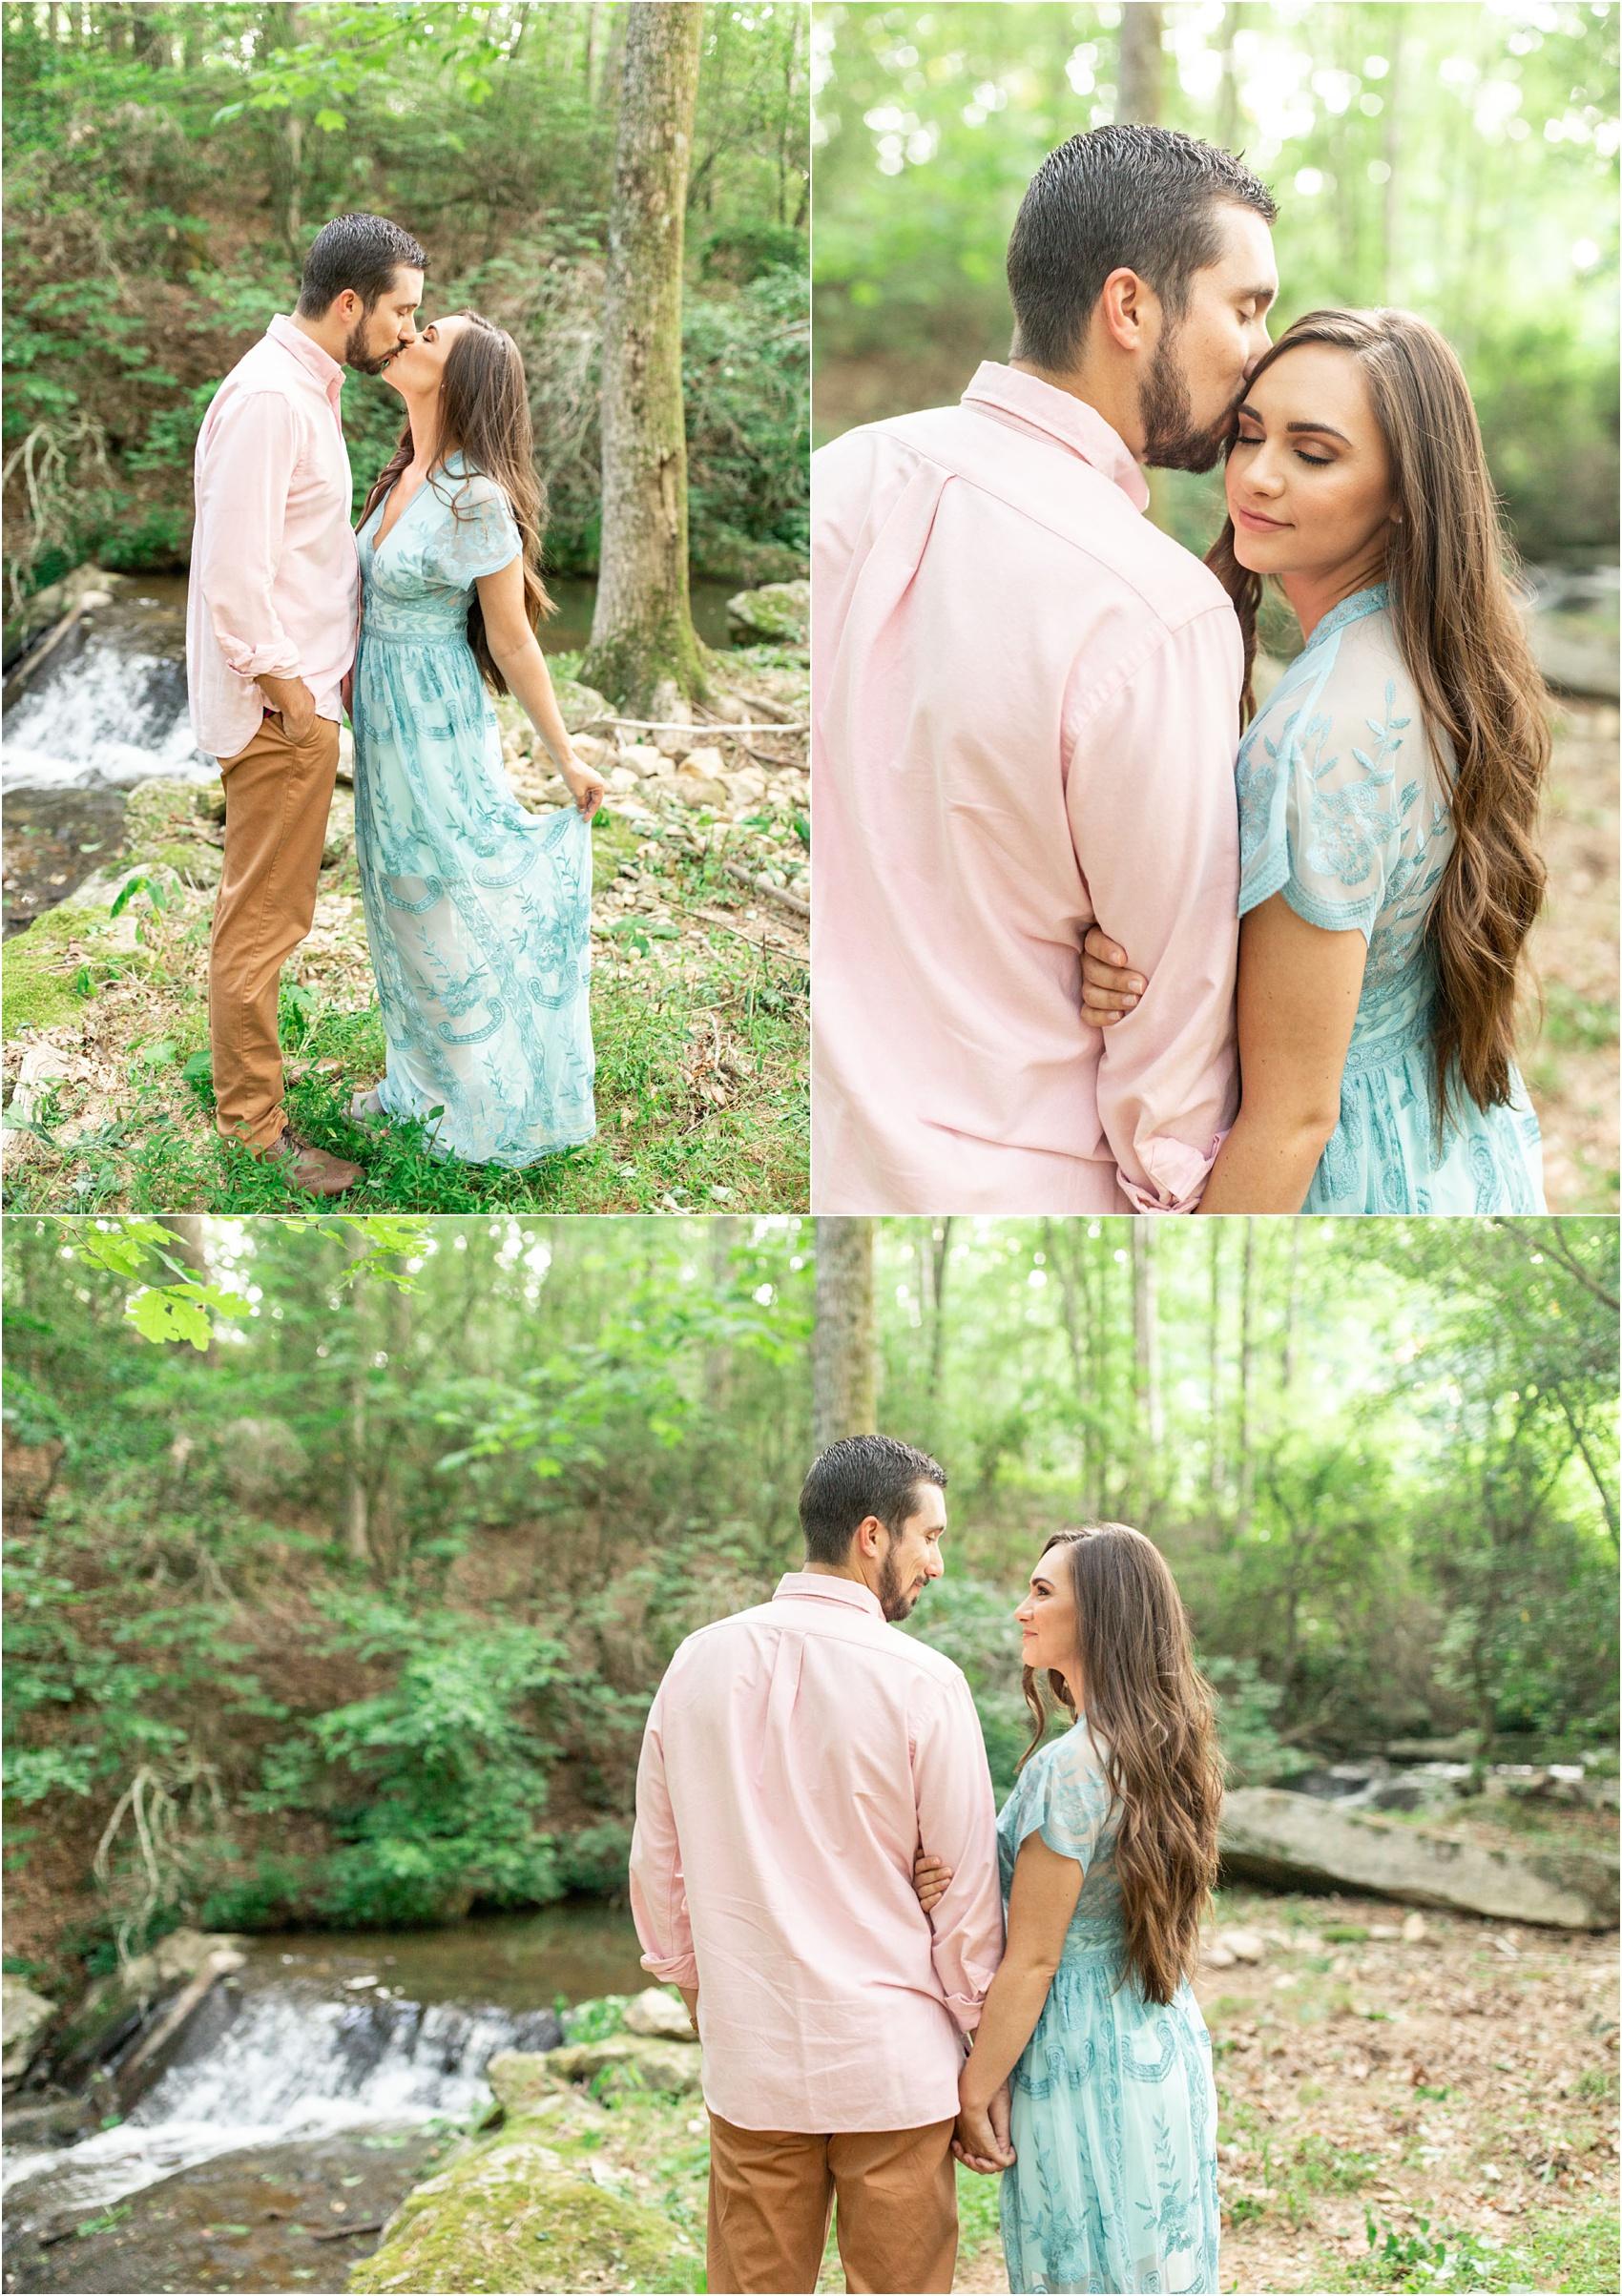 Savannah Eve Photography LLC- Tiffani & Josh Beck @ The Walters Barn- Blog-9.jpg